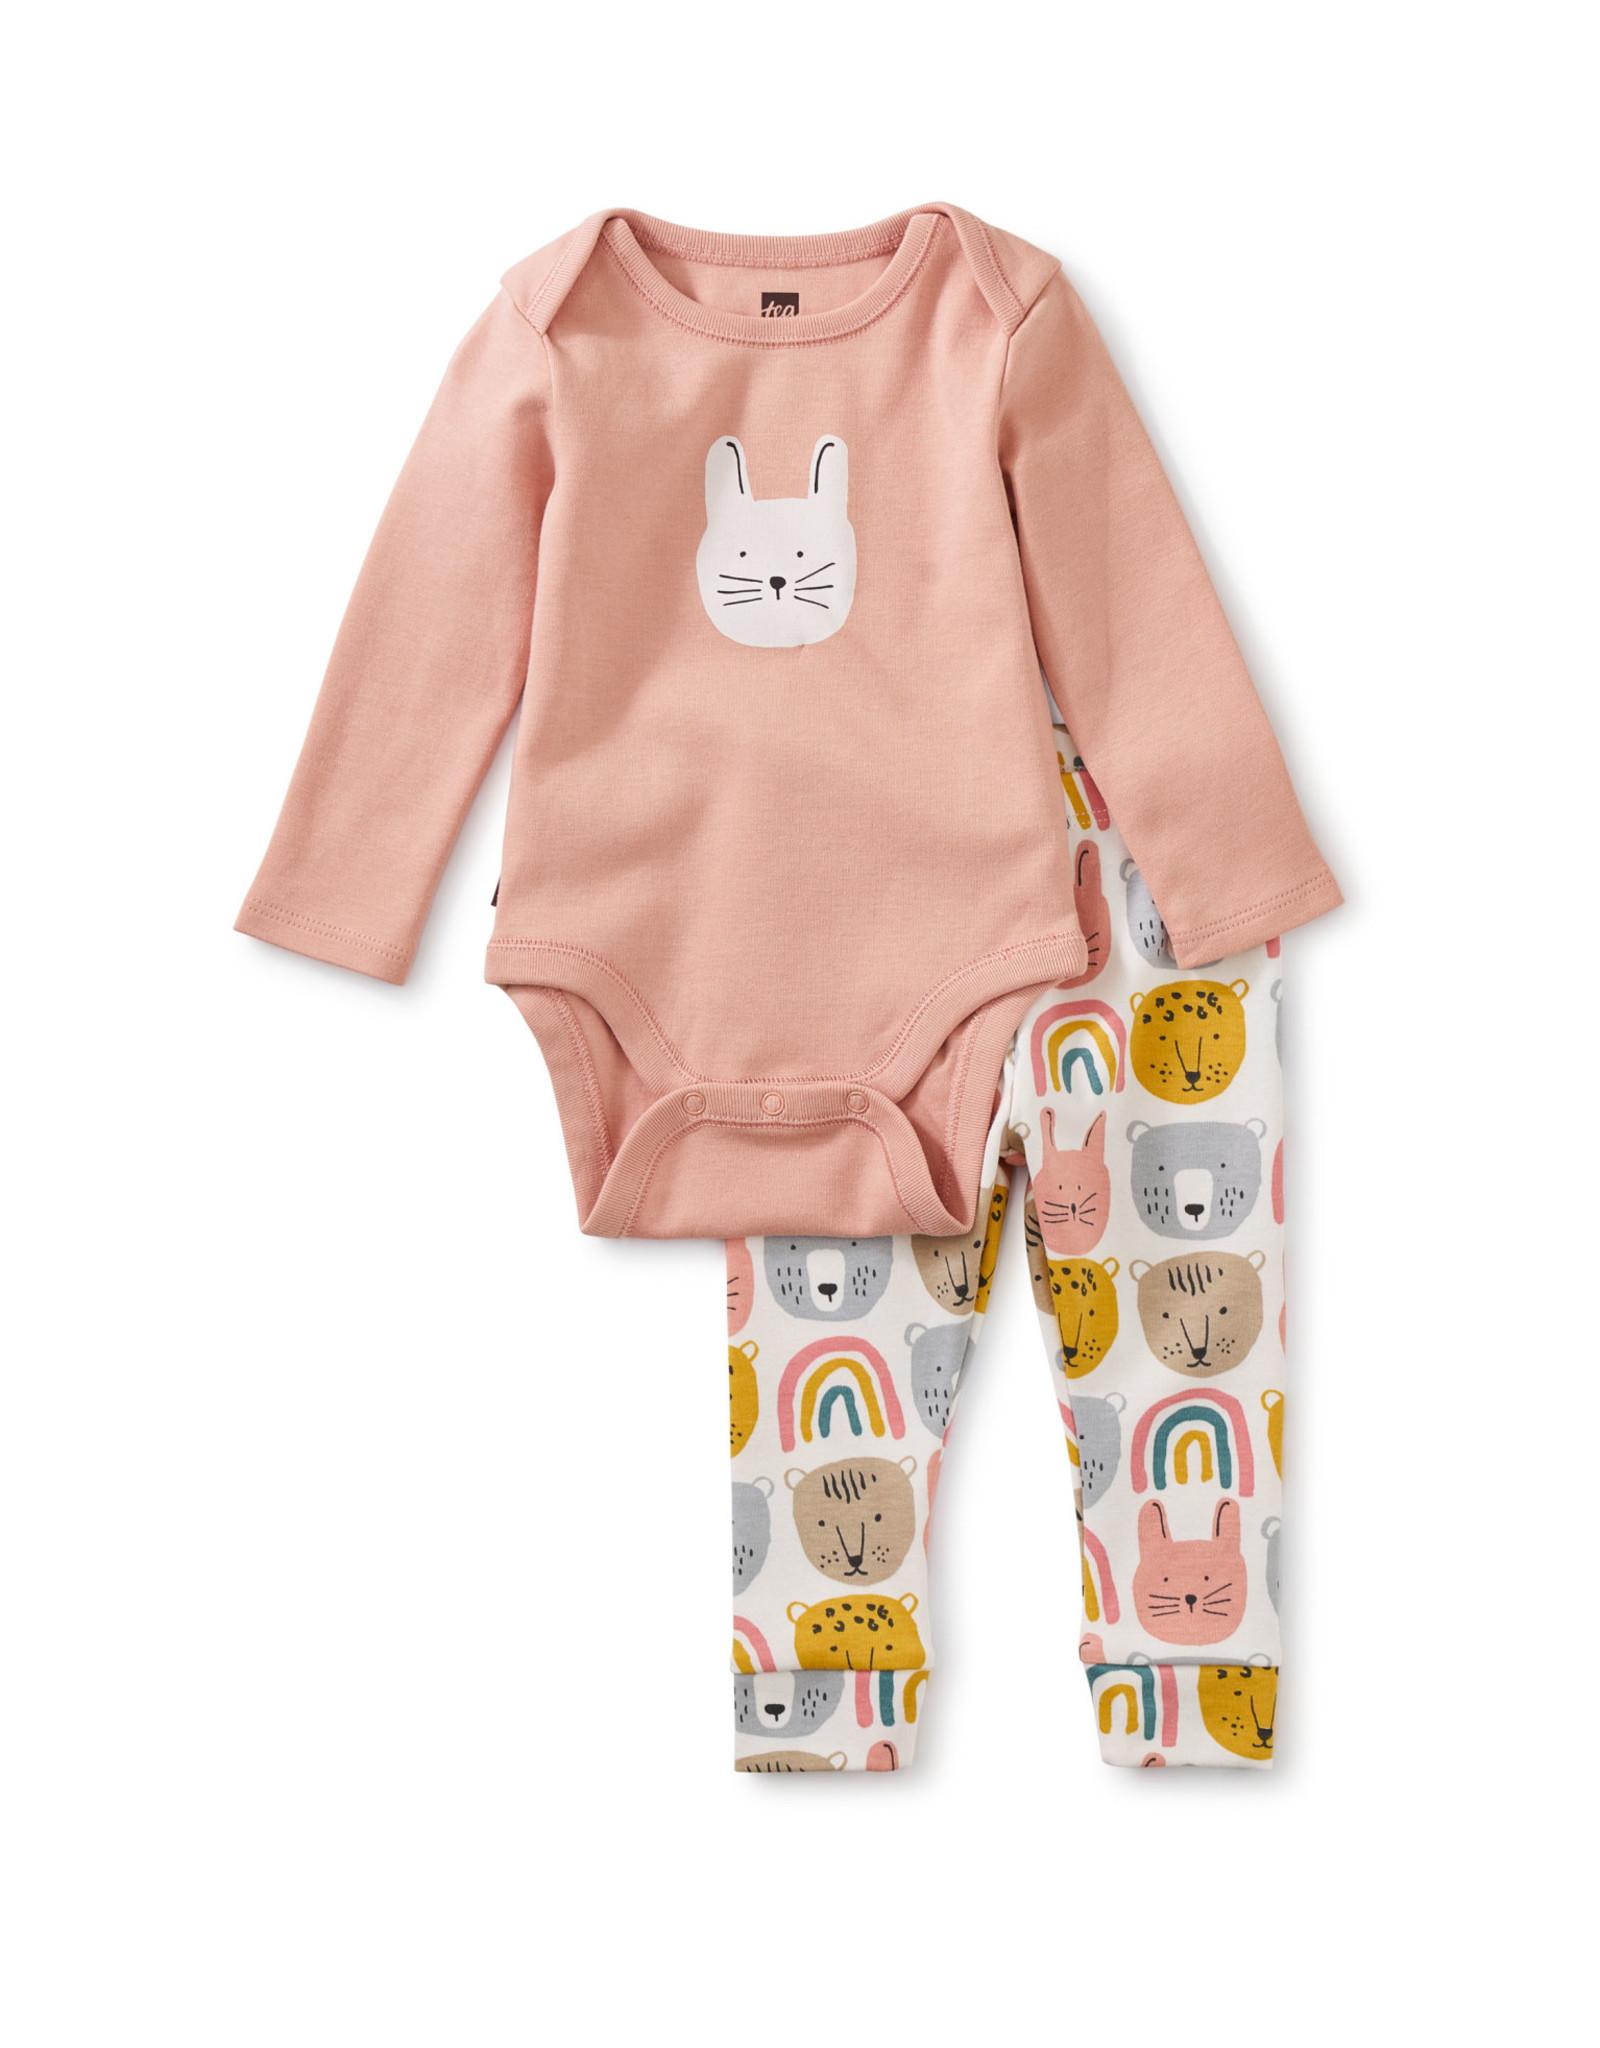 Tea Bodysuit Baby Outfit, Rainbow Animals